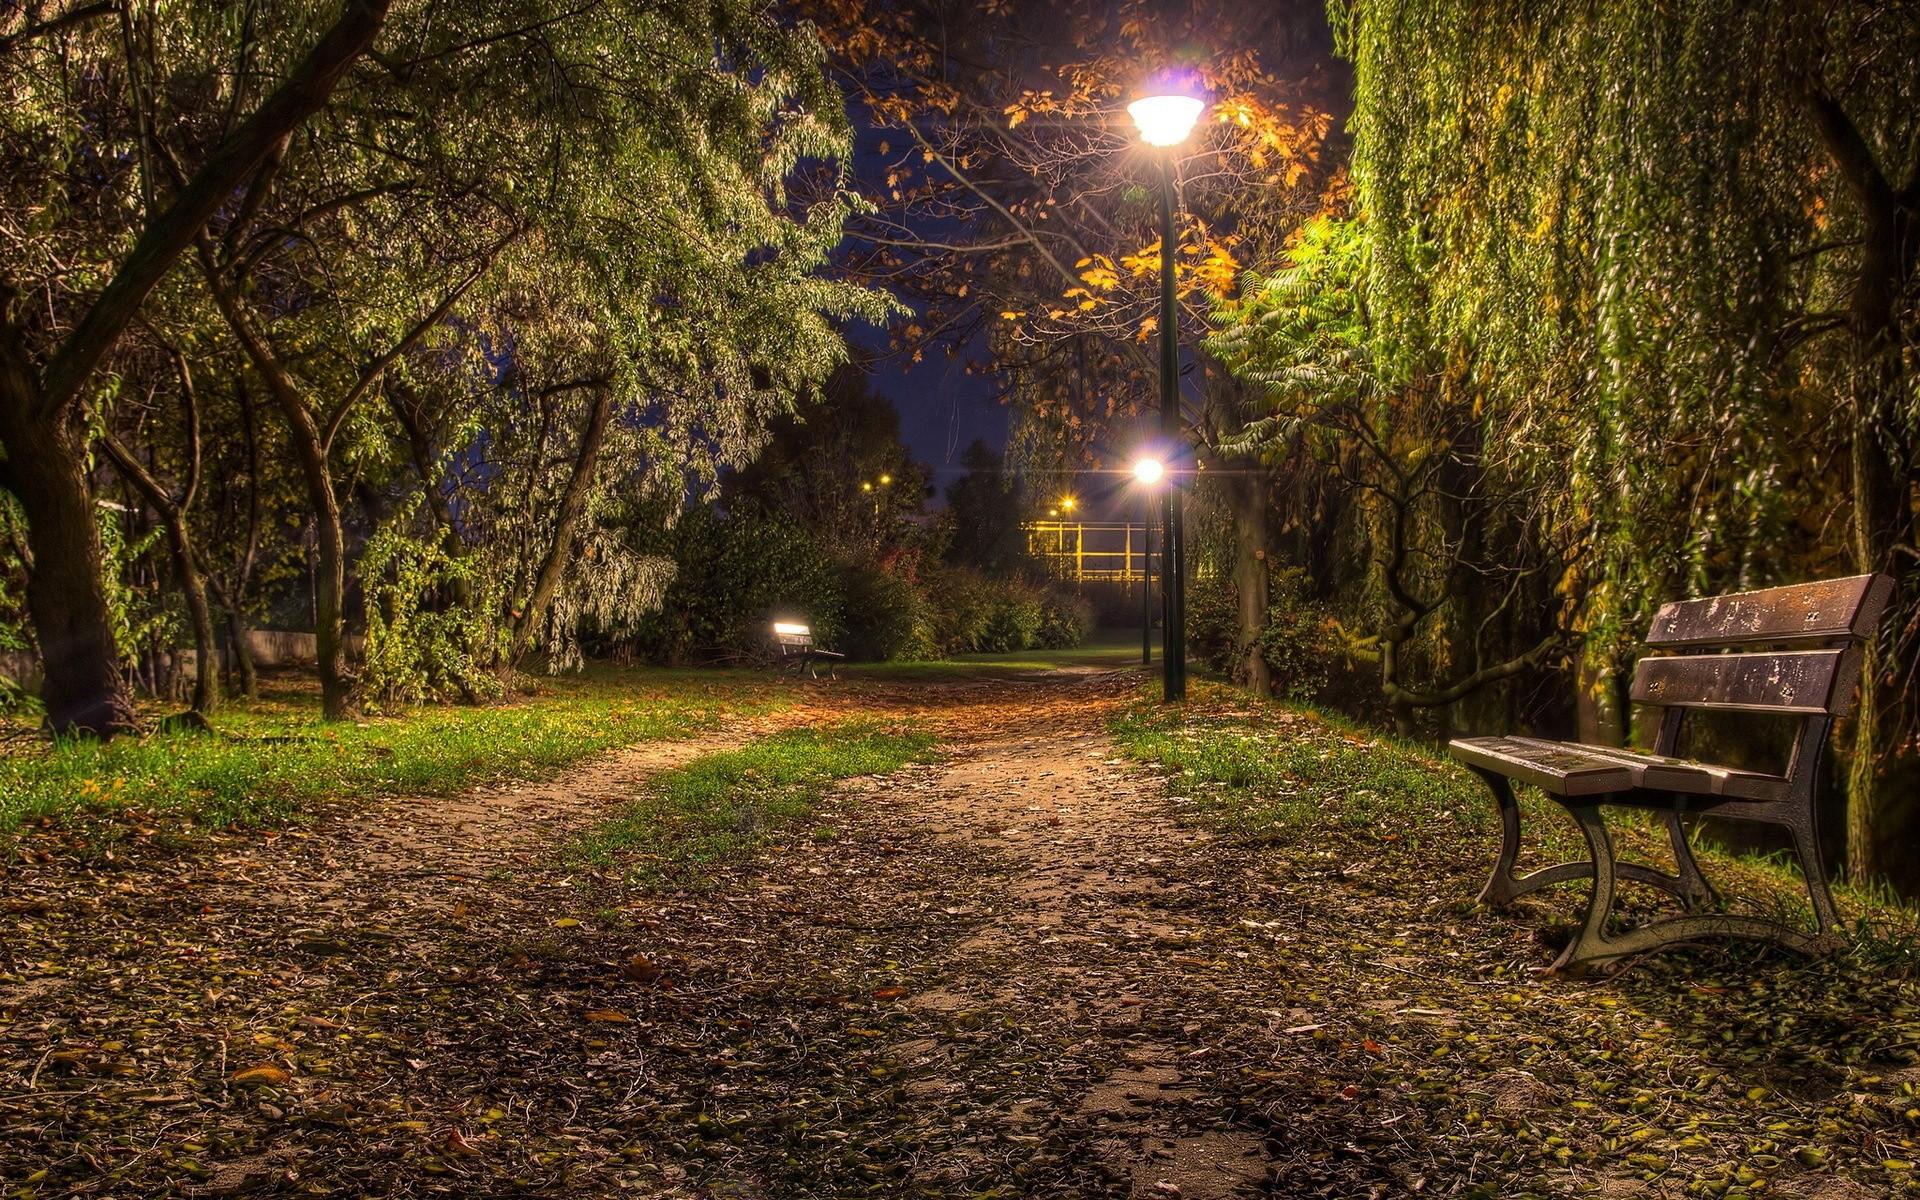 Nature Night Bench Wallpaper 1920x1200 Download Hd Wallpaper Wallpapertip